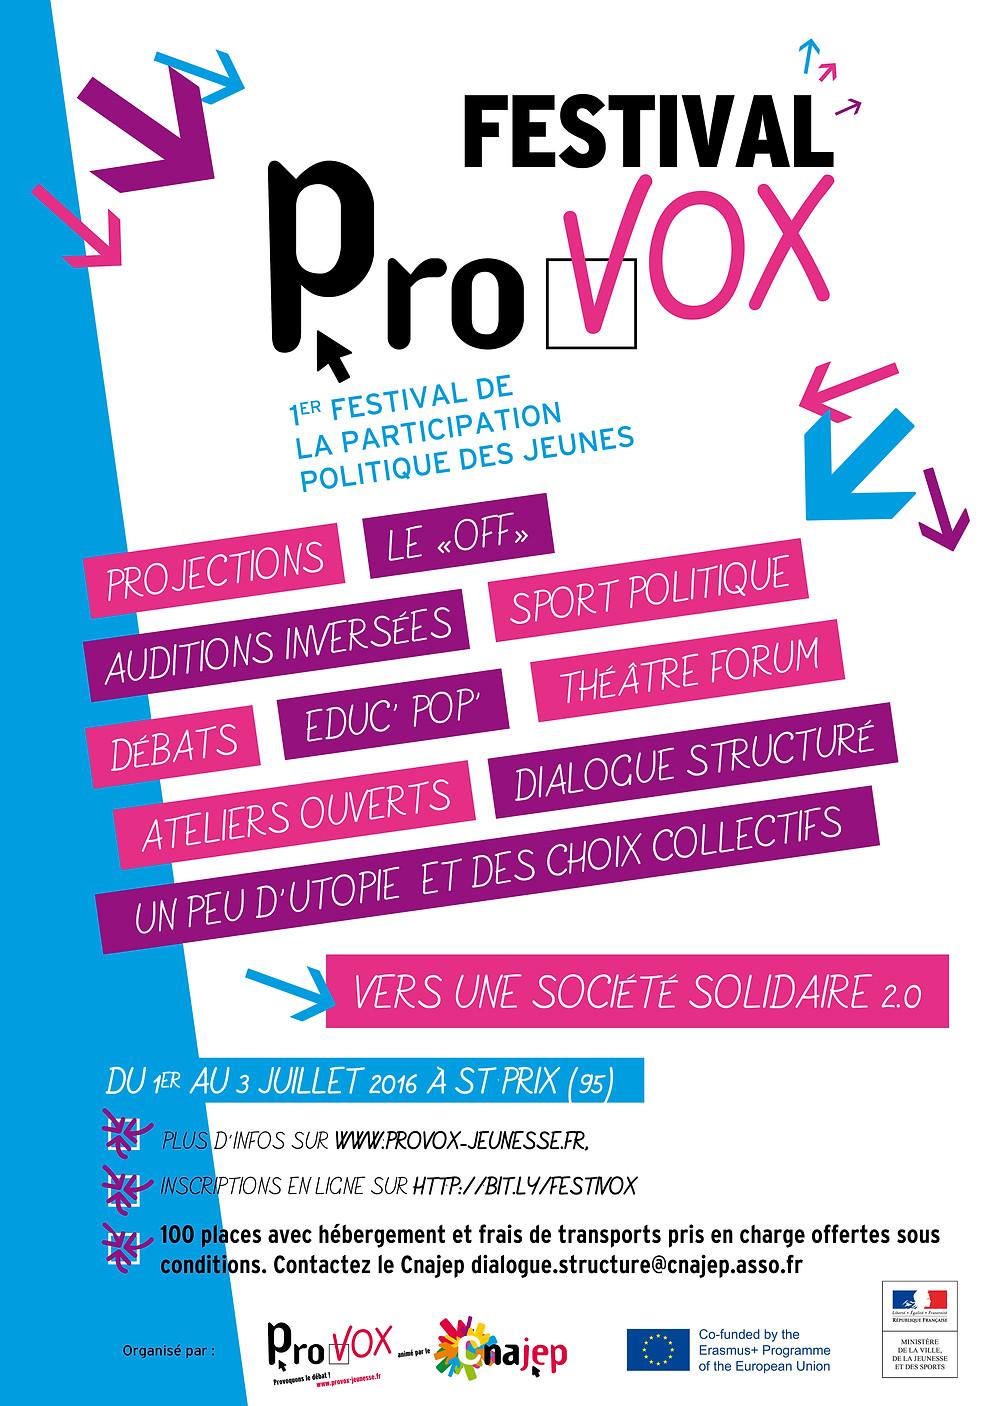 Provox Festival